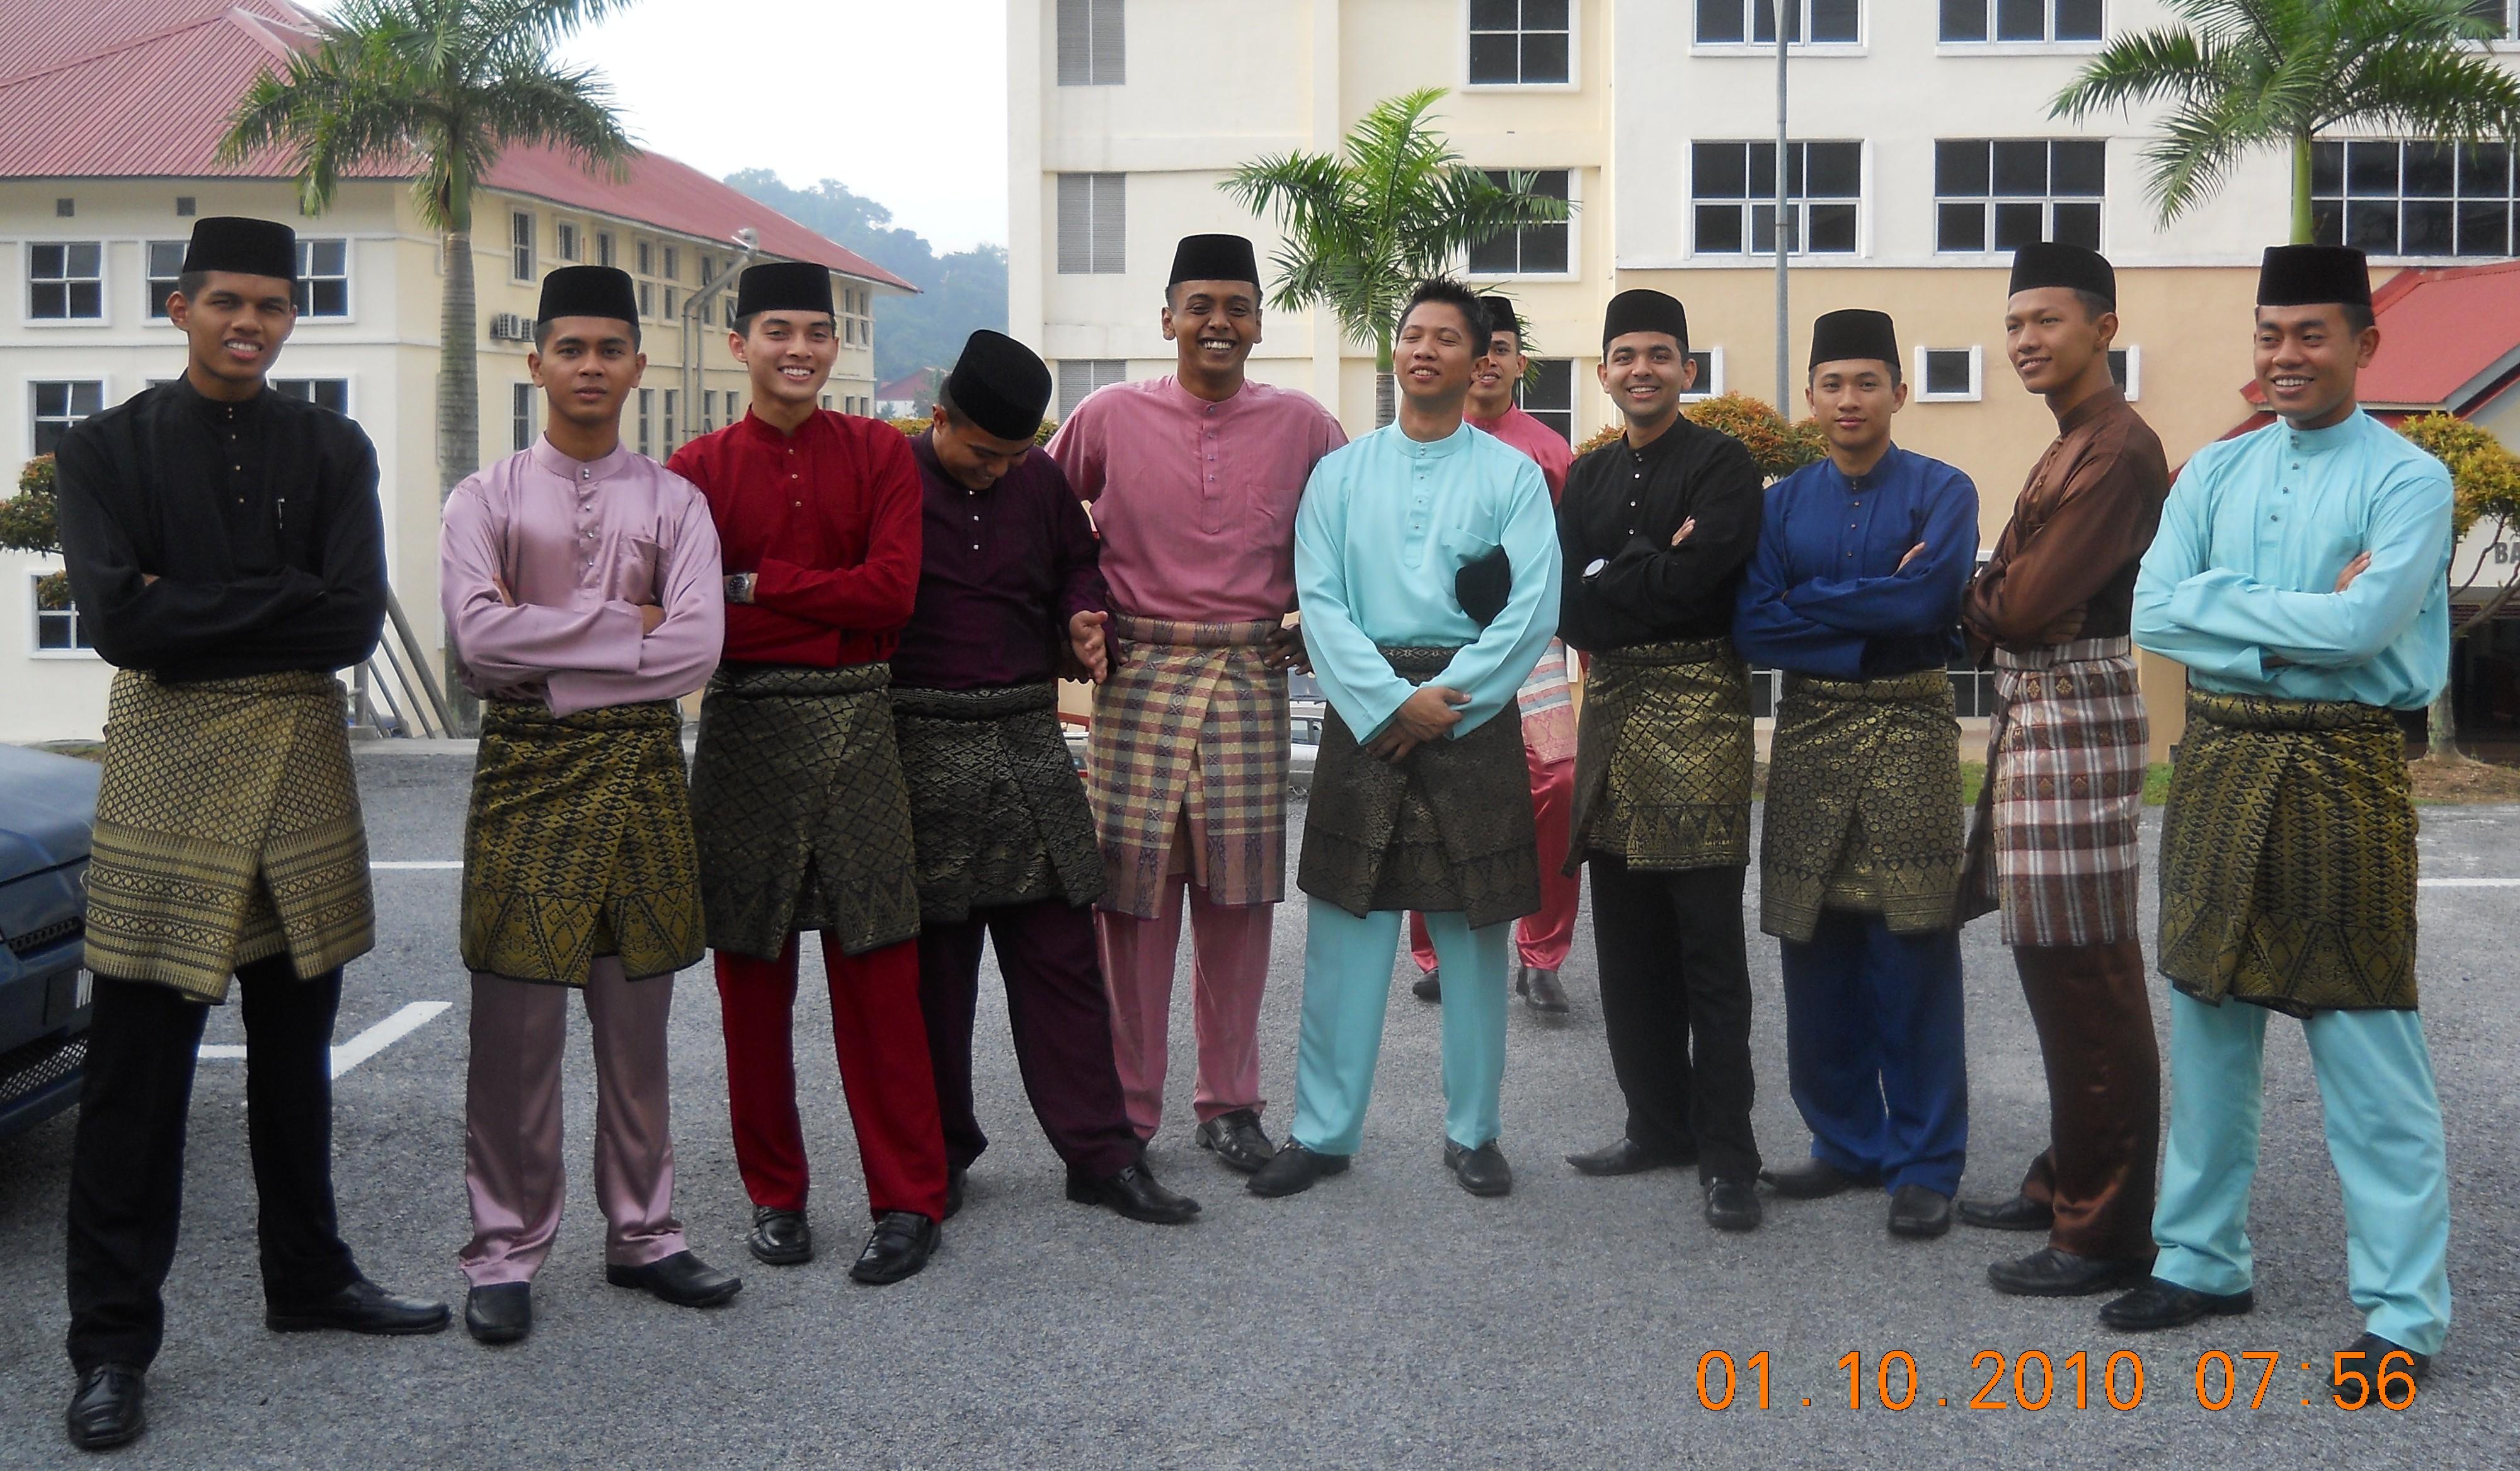 Baju Melayu Wikipedia